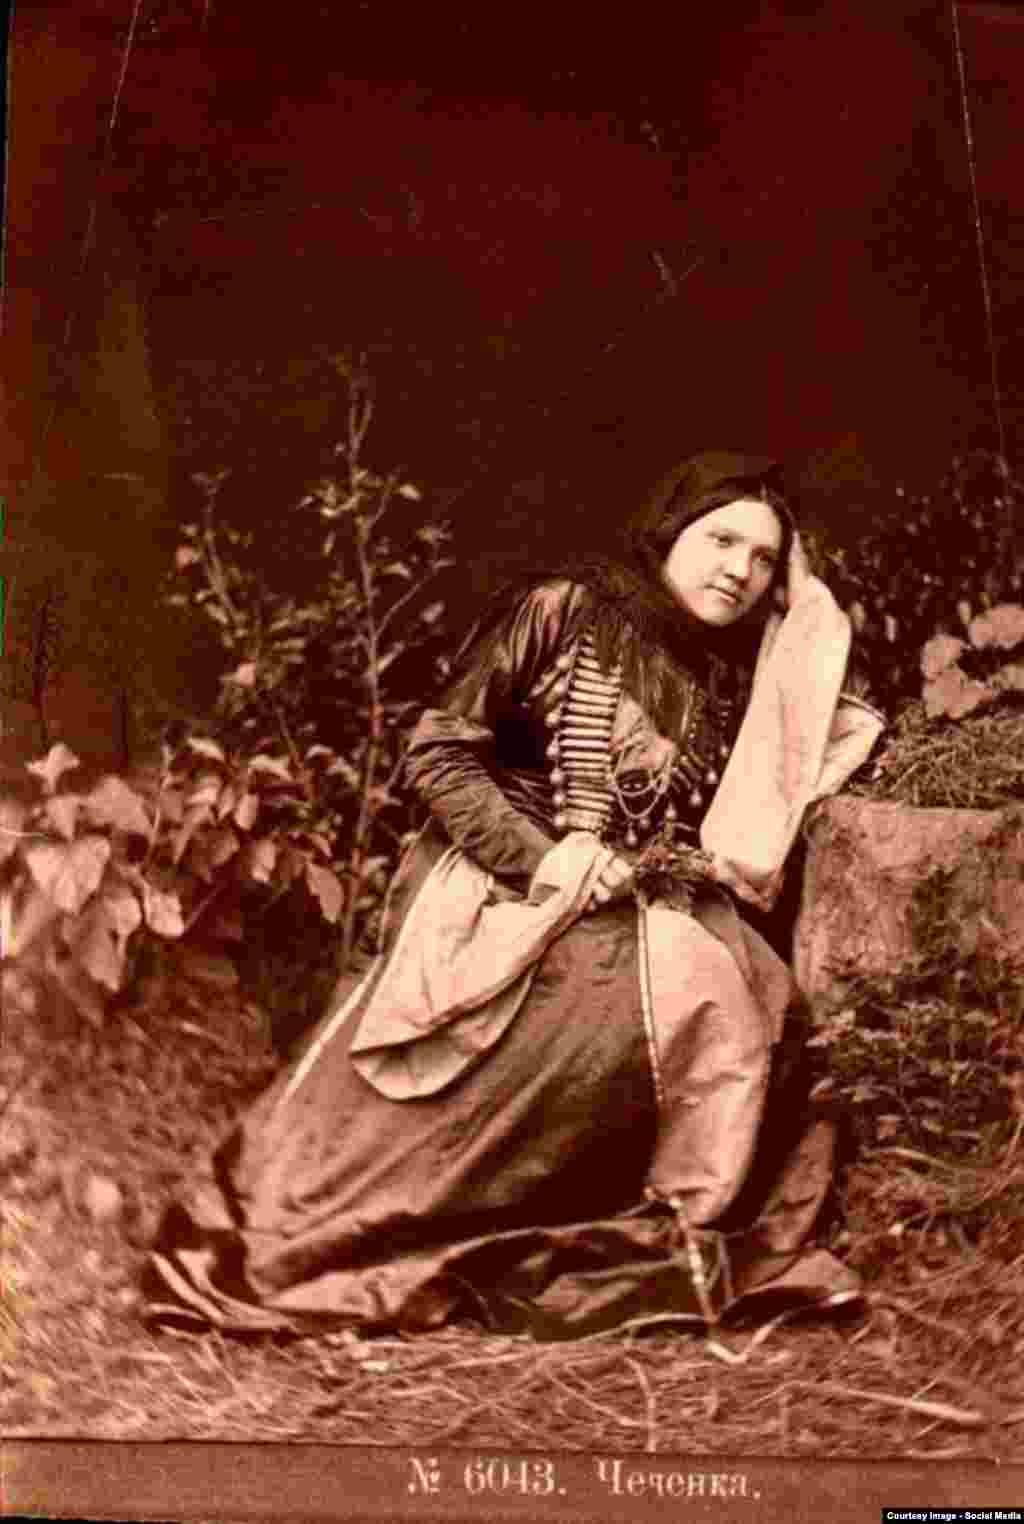 Чеченка, дочь Генжуева из Воздвиженска. Фотография Д. Ермакова